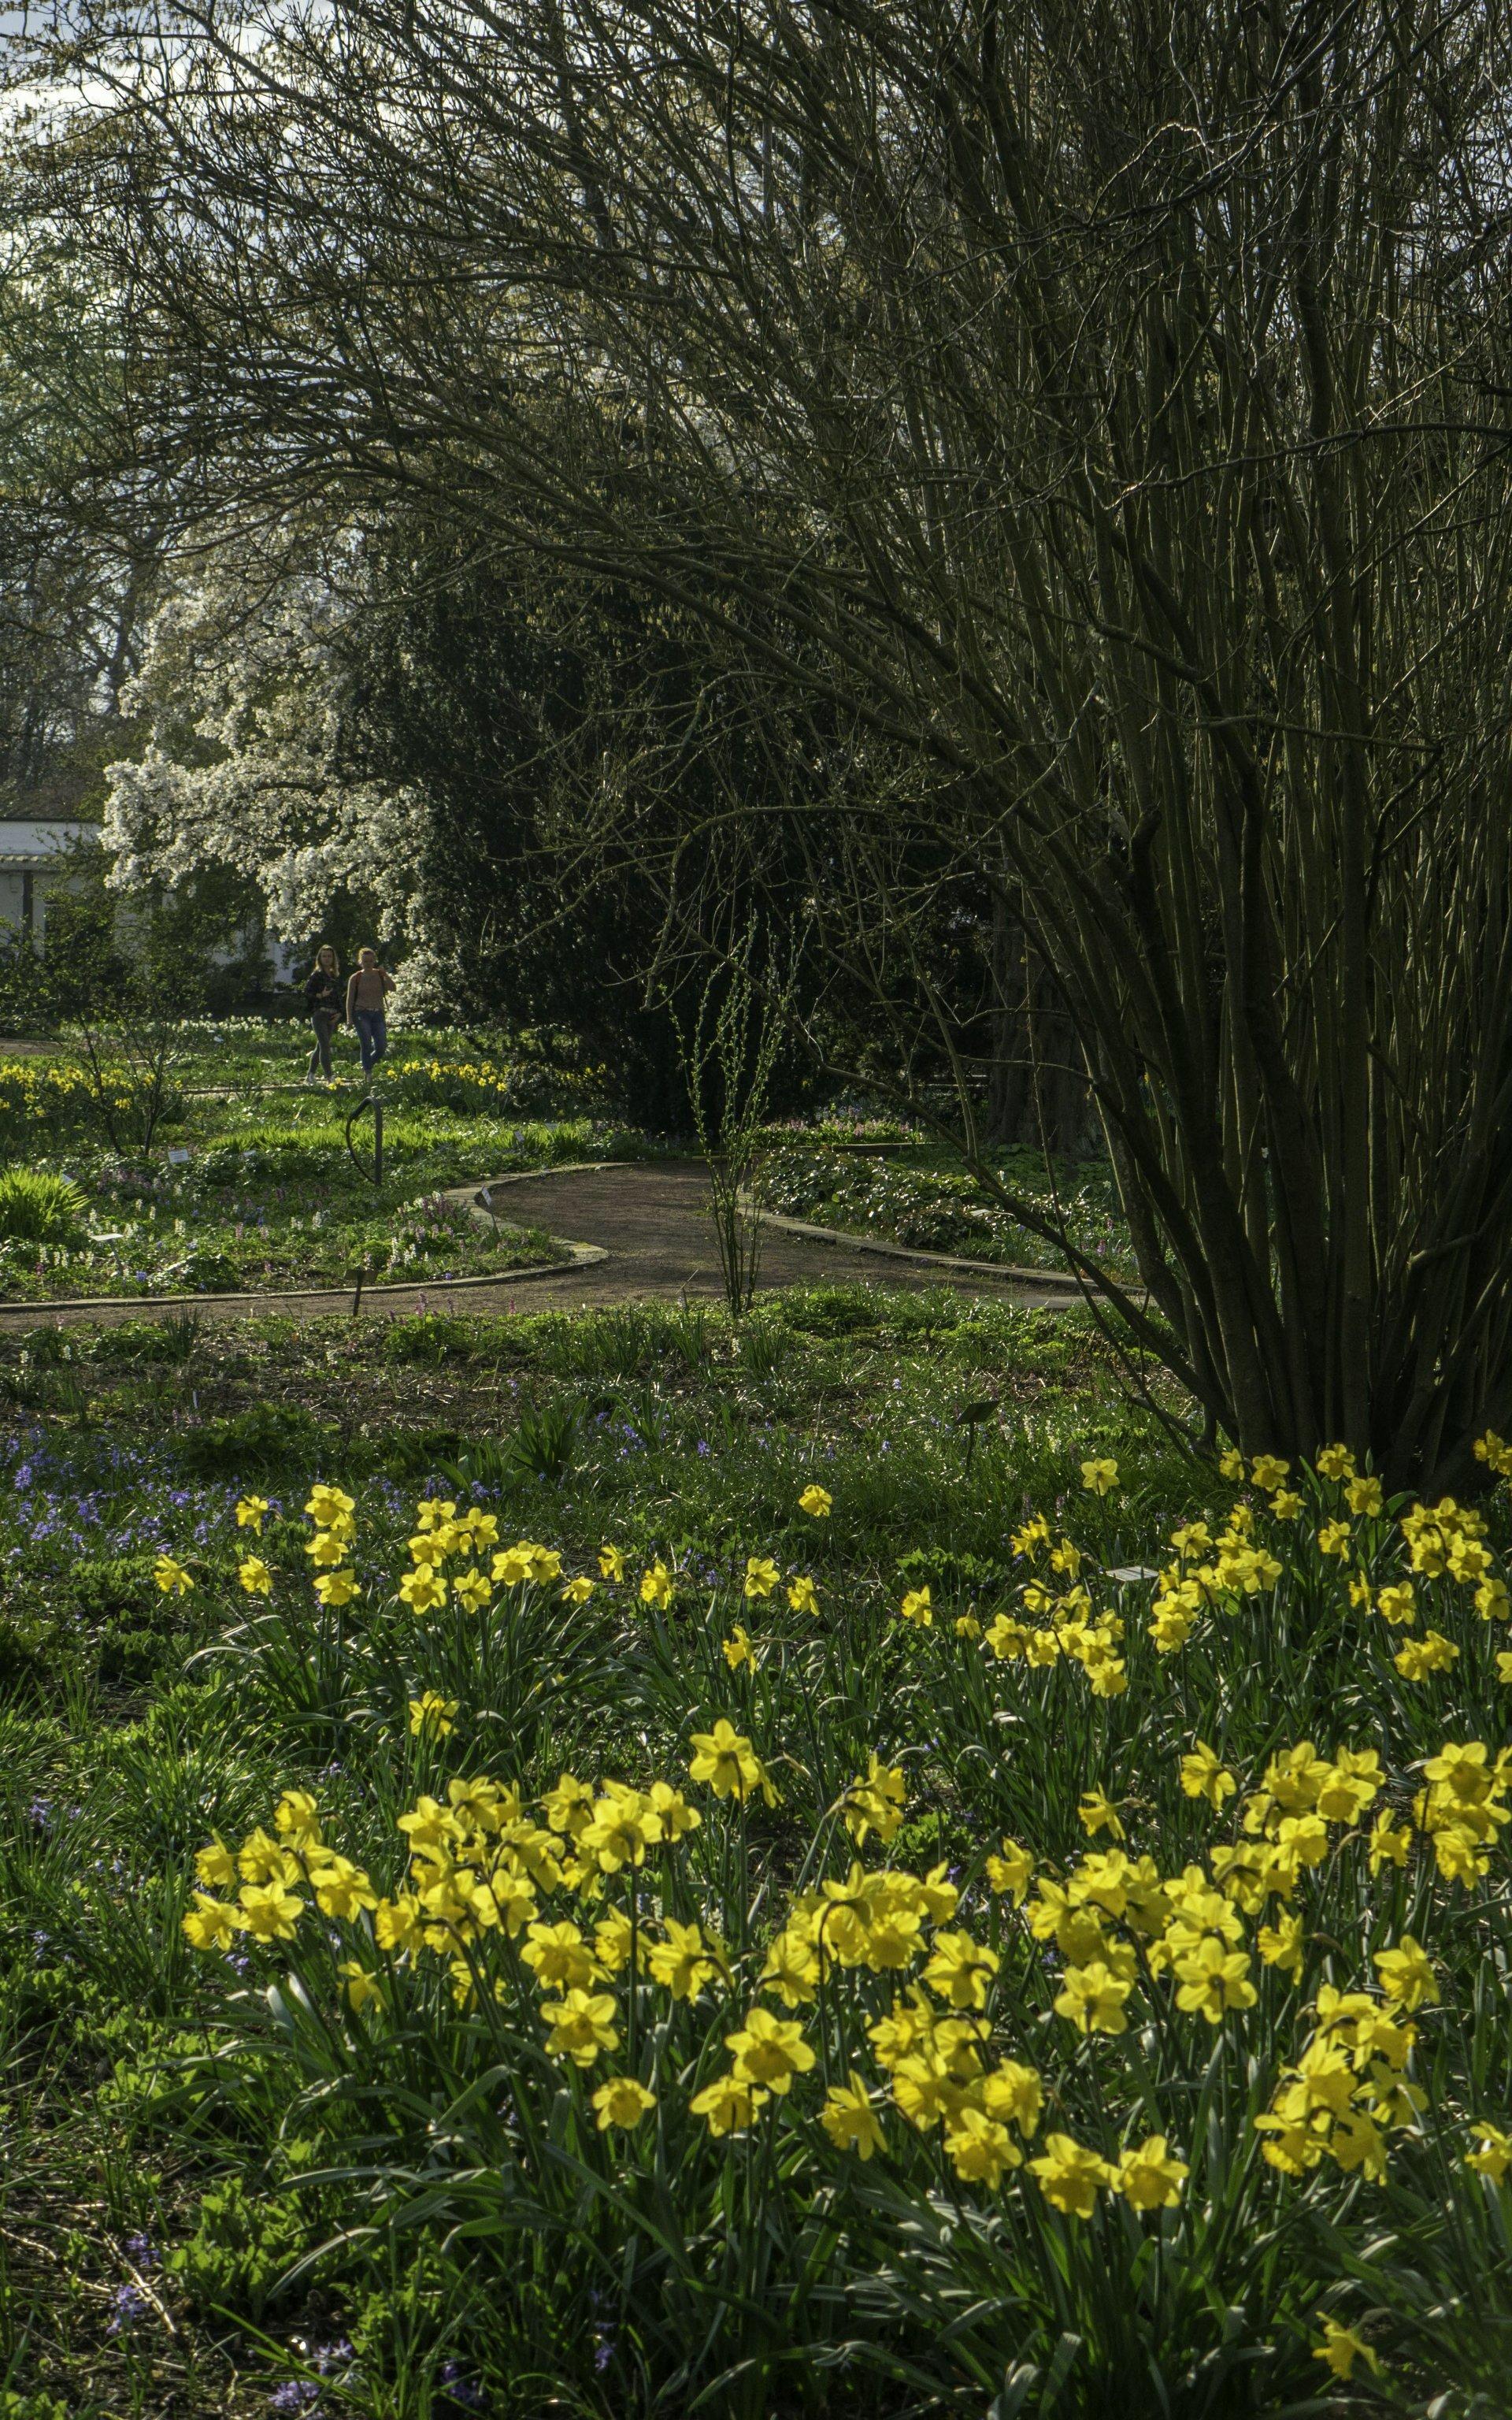 Osterglocken bei den Frühjahrsblumen im Stadtpark